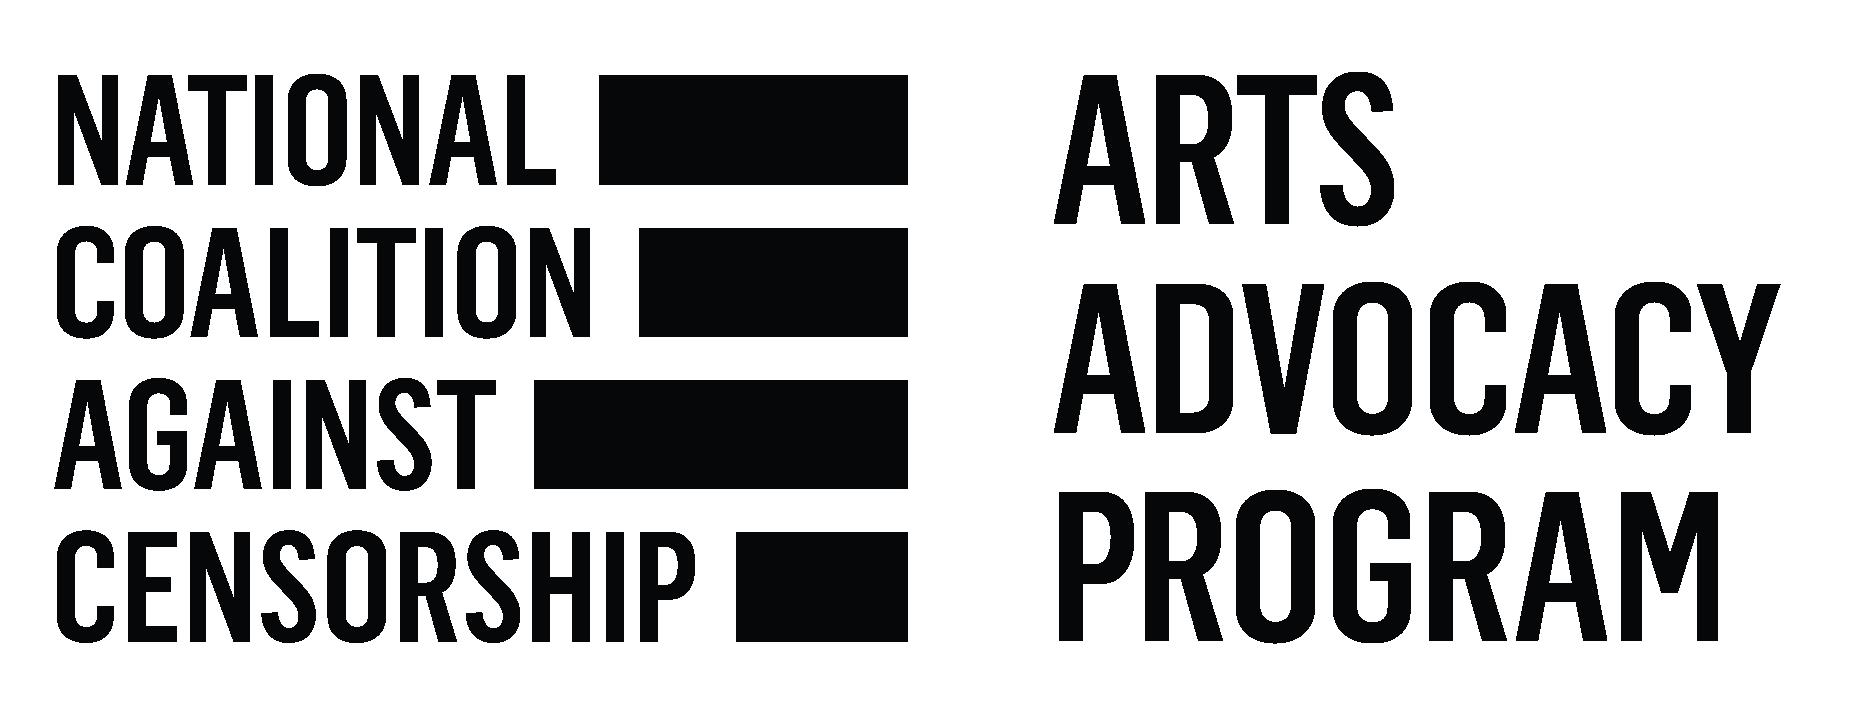 Arts Advocacy Program